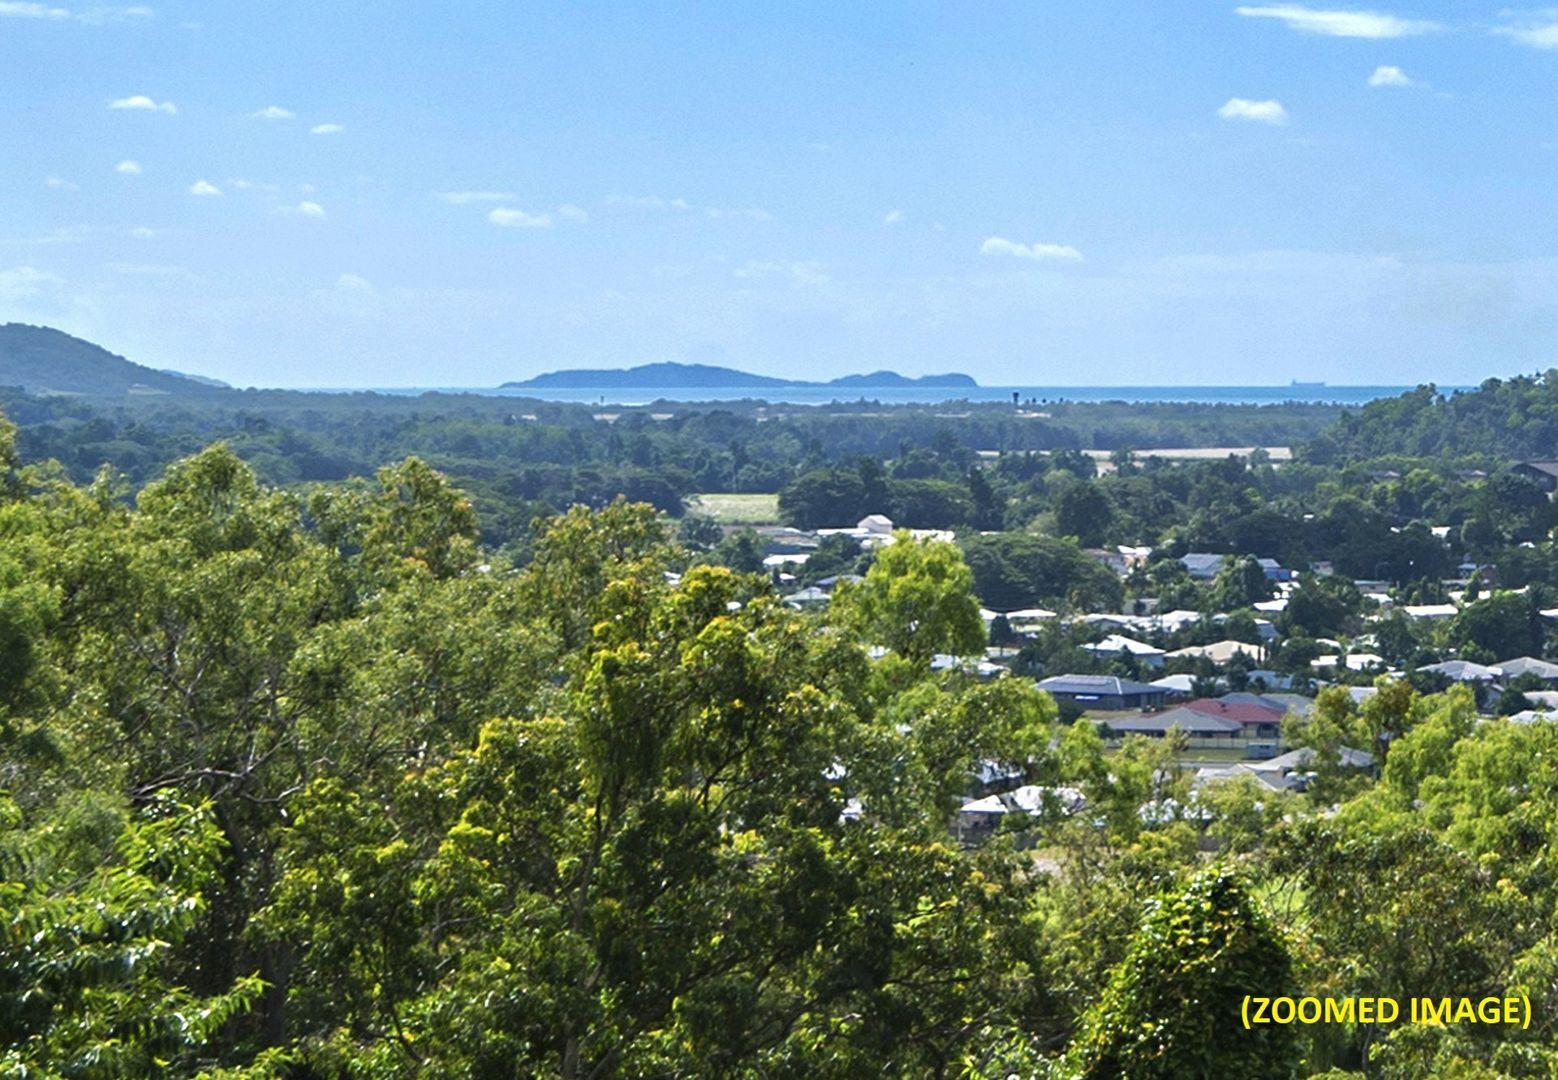 37-41 Coral Sea Drive, Mossman QLD 4873, Image 1